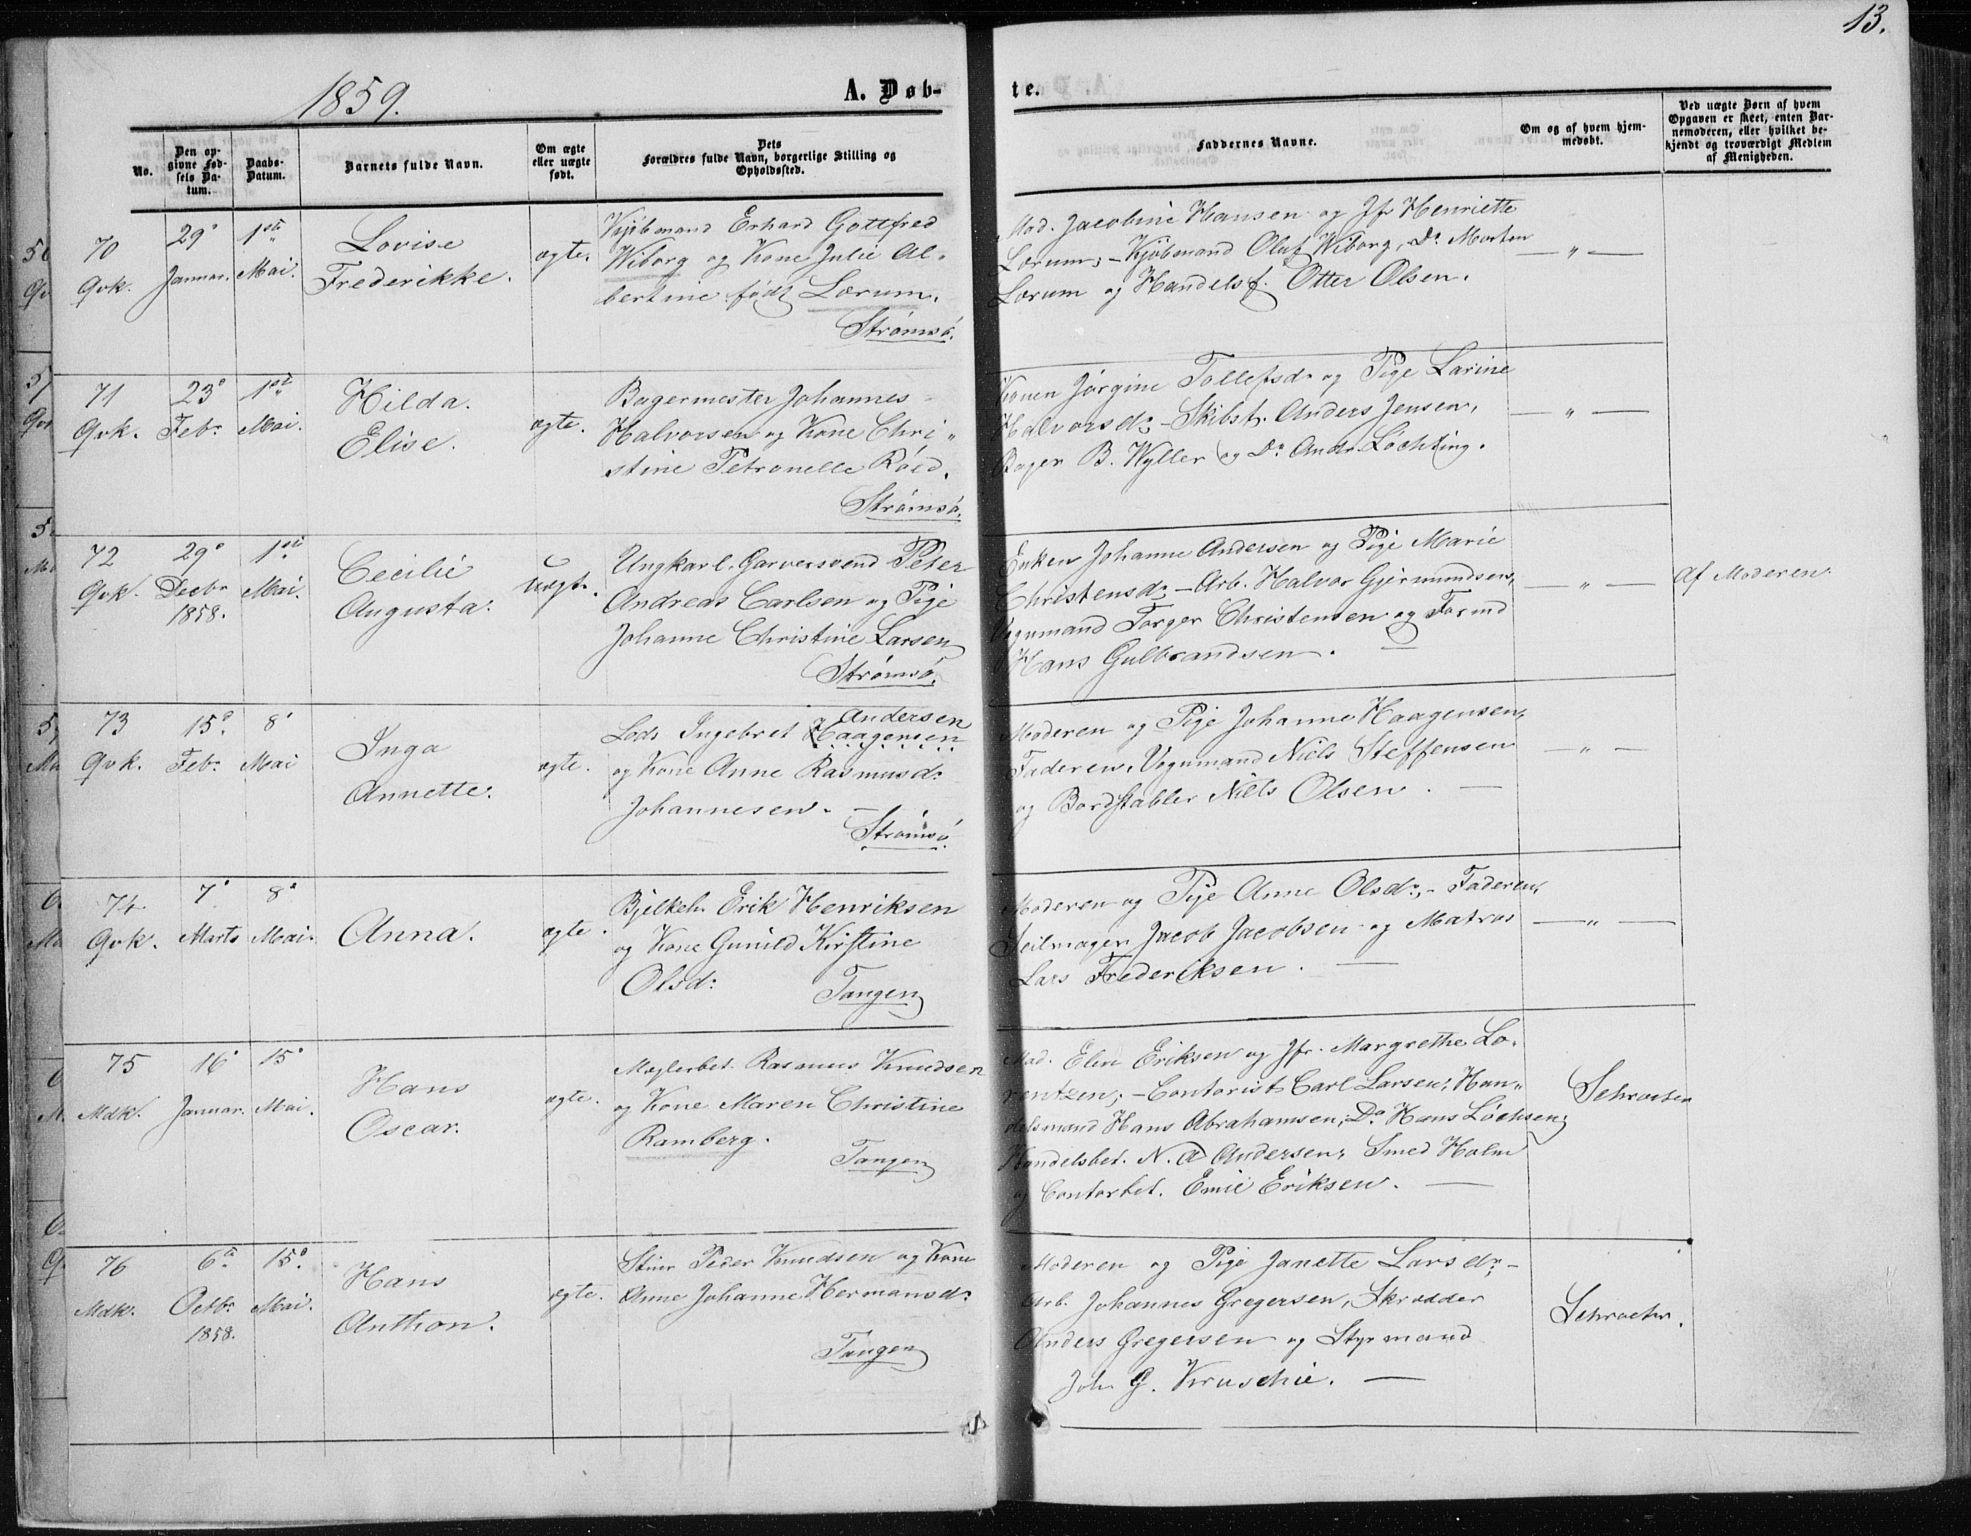 SAKO, Strømsø kirkebøker, F/Fa/L0015: Parish register (official) no. I 15, 1859-1868, p. 13